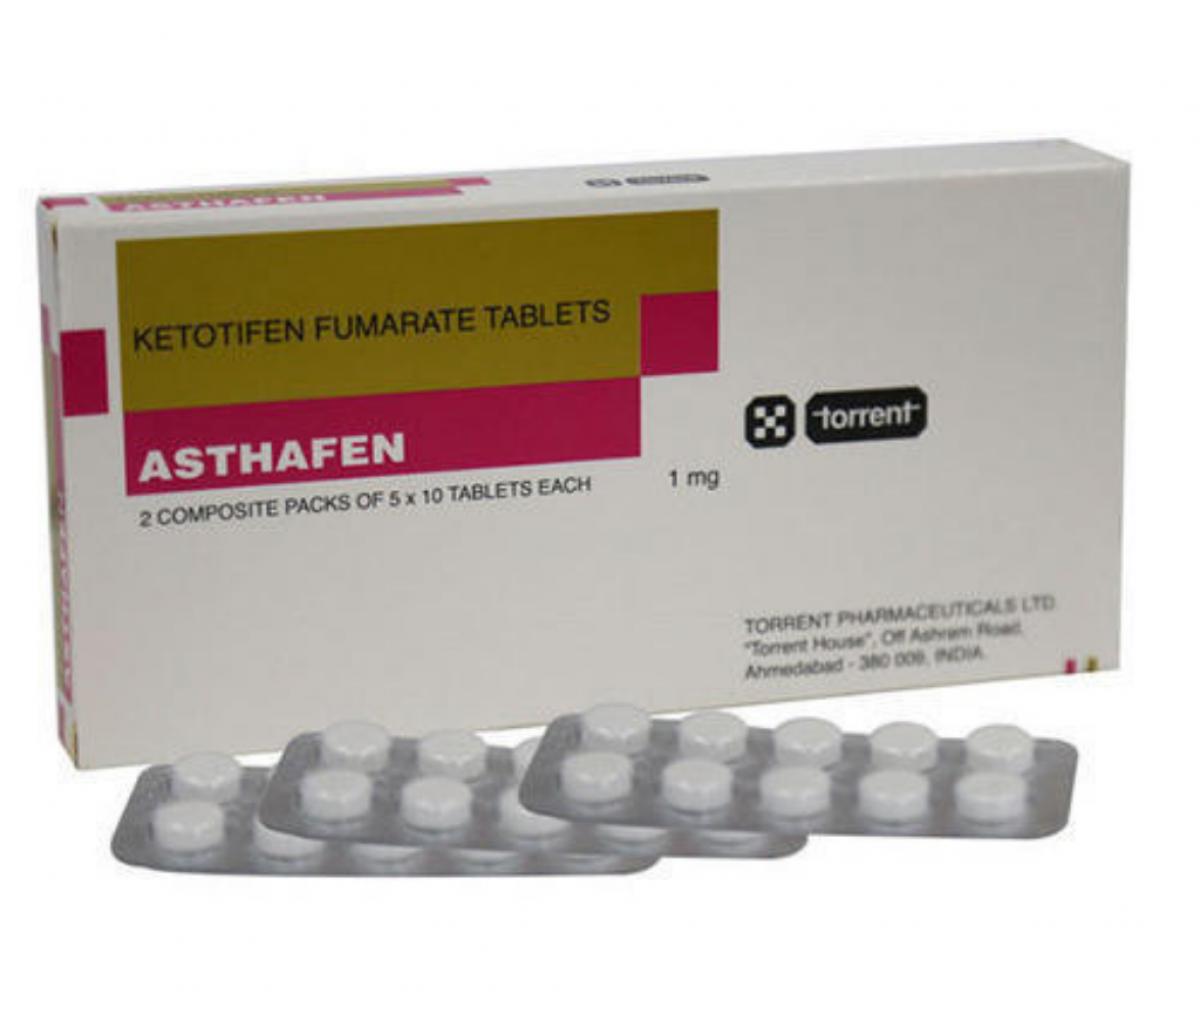 Asthafen 1 mg Tablet